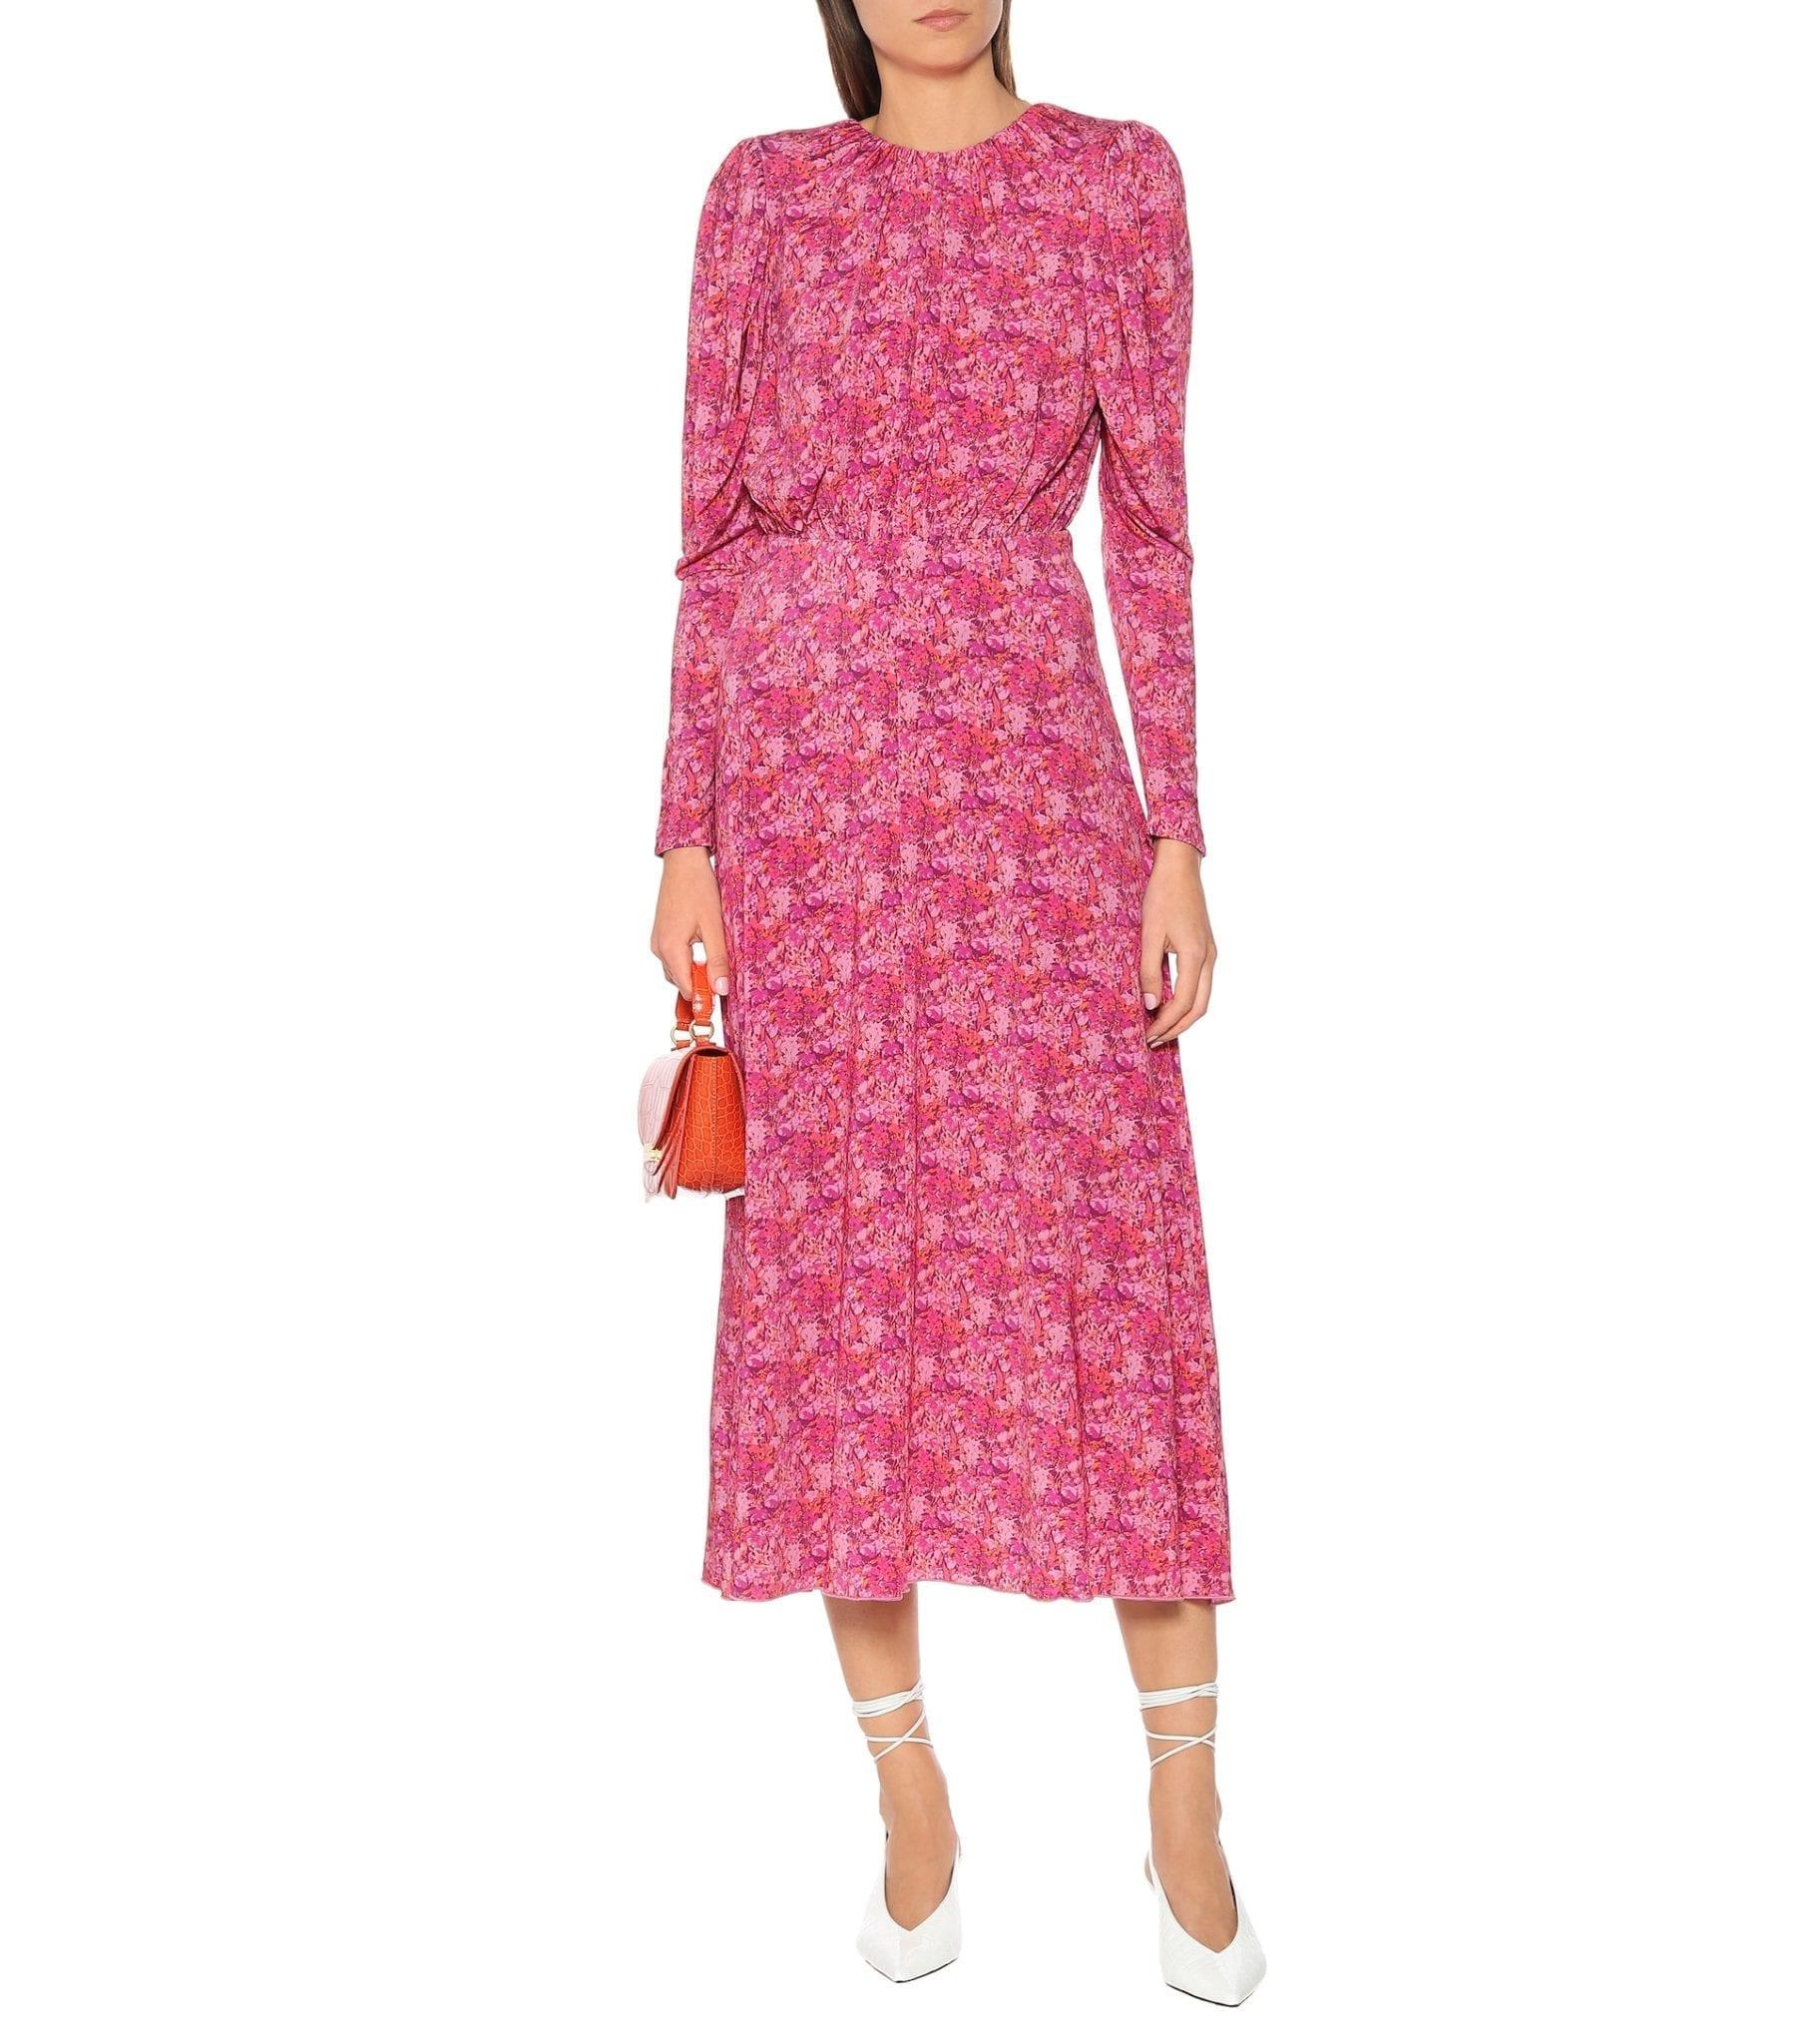 ROTATE BIRGER CHRISTENSEN Floral Stretch-jersey Midi Dress